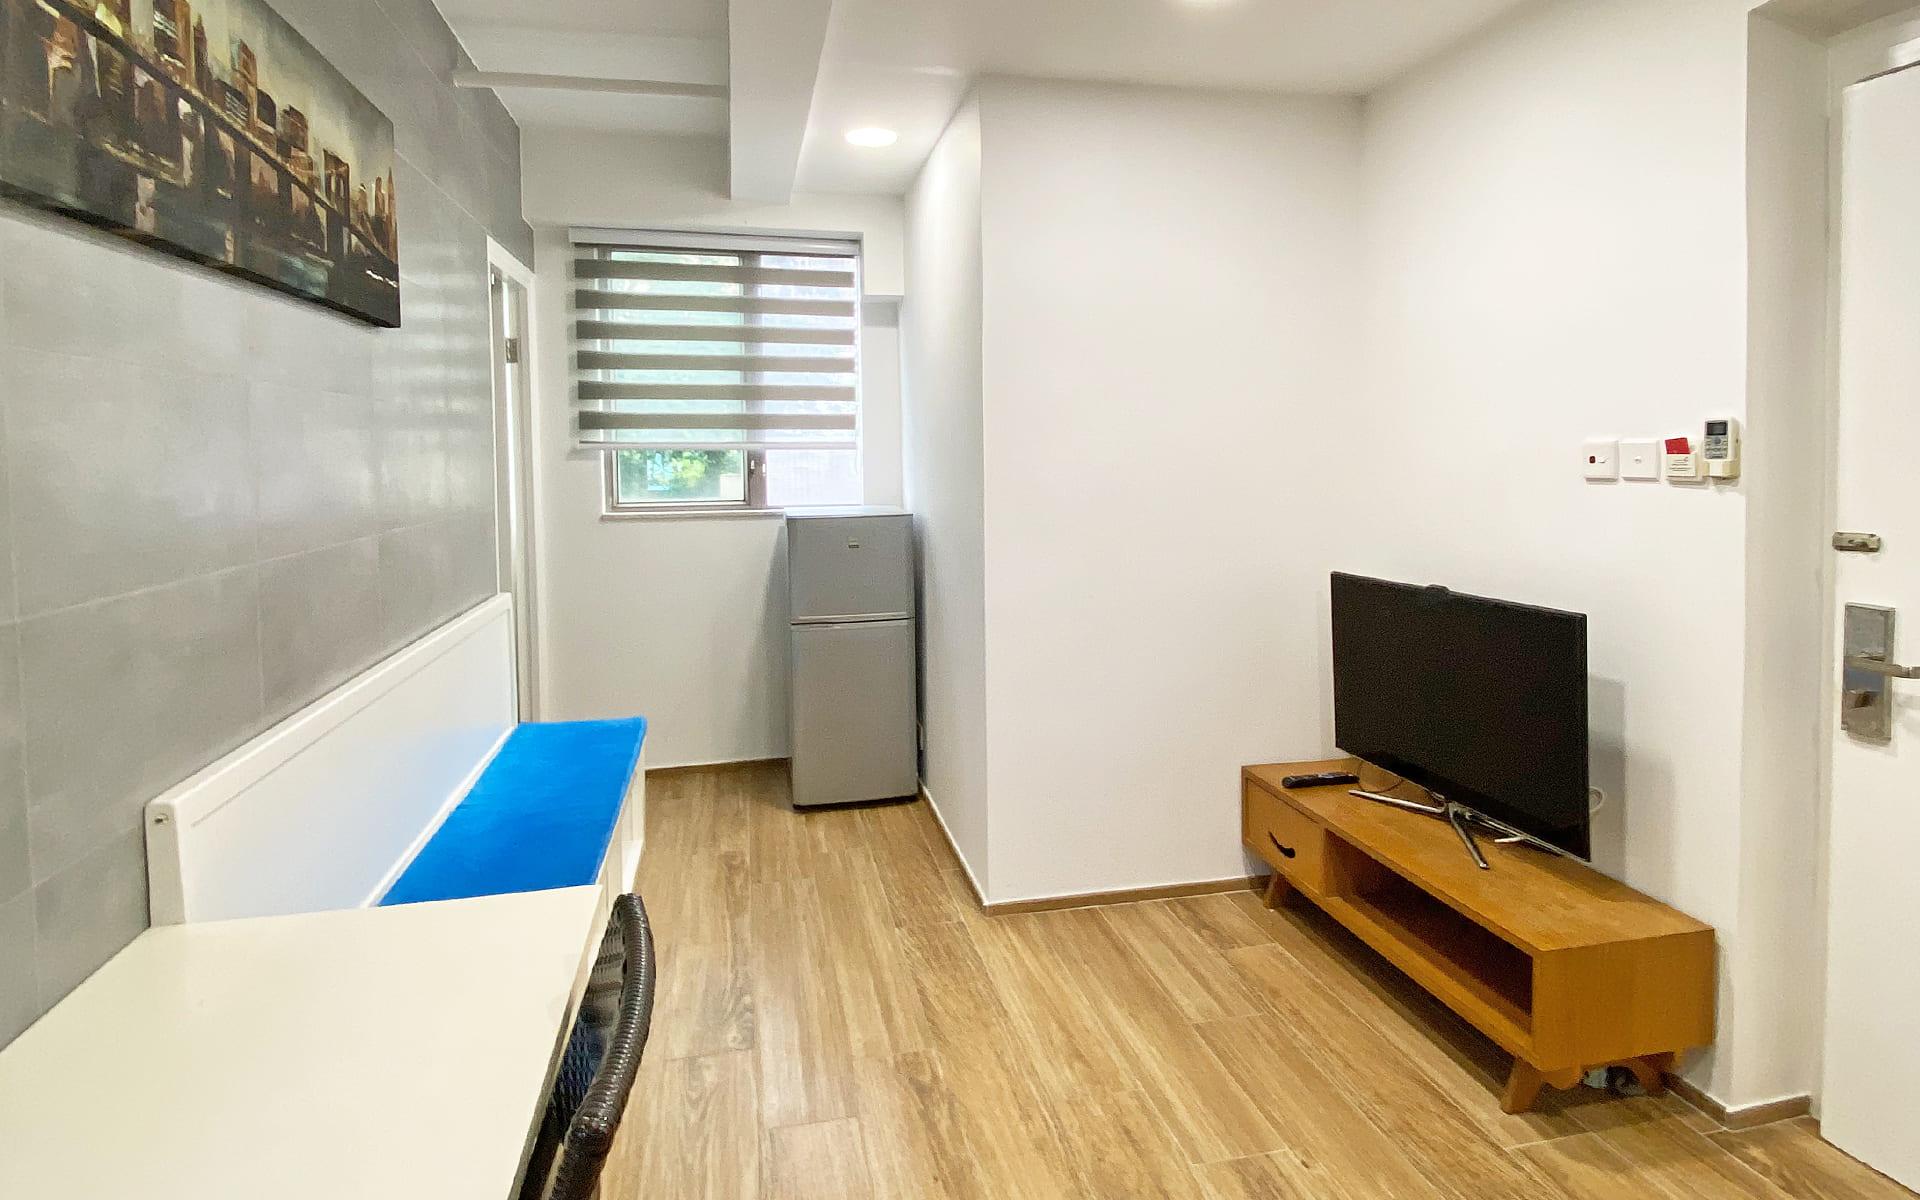 hk_service_apartment_8654046321593399938.jpg